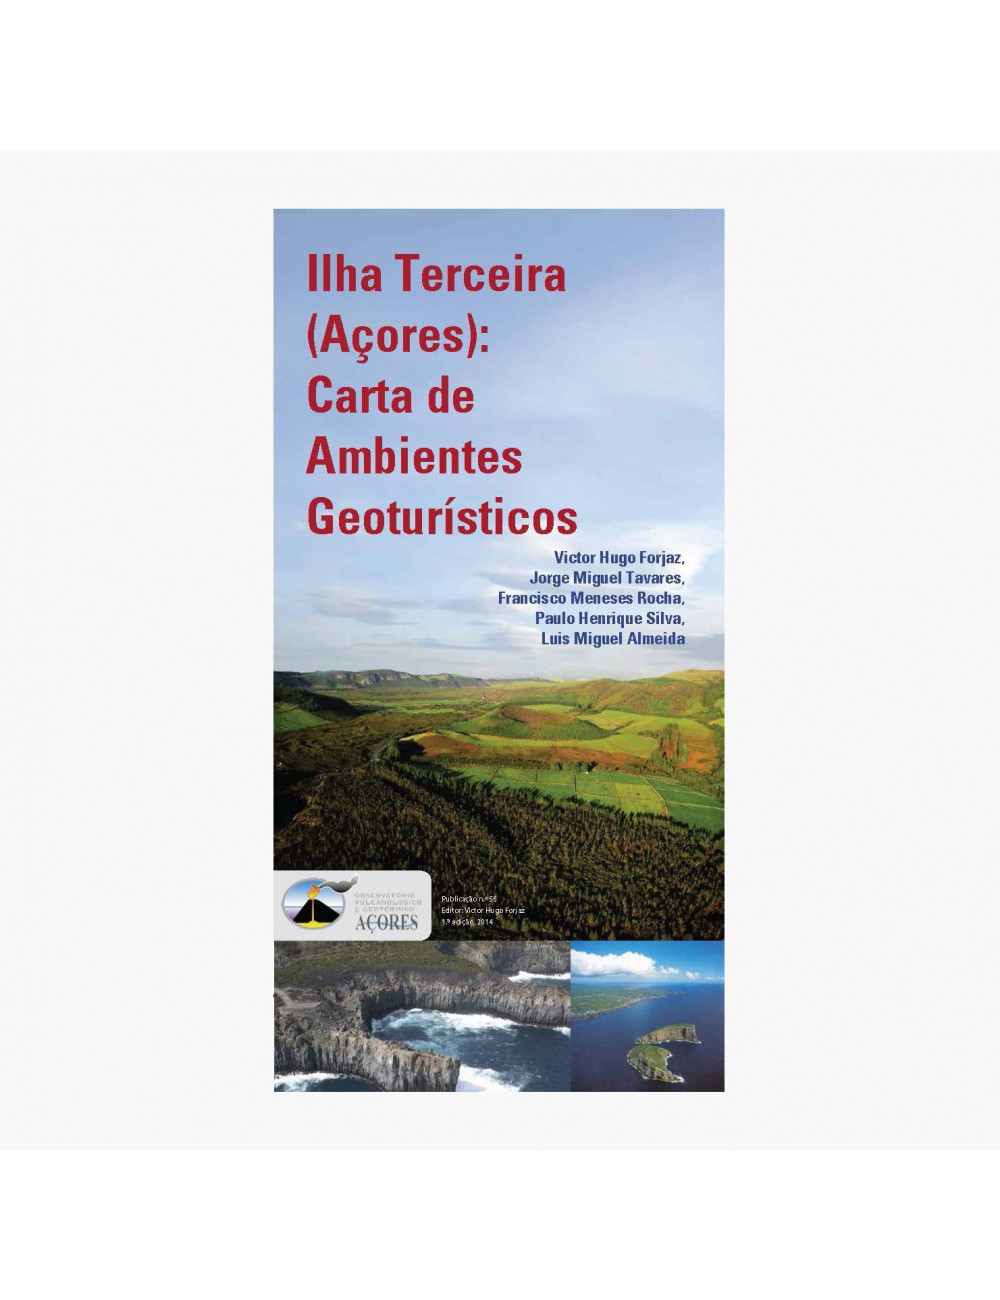 Ilha Terceira: Carta de Ambientes Geoturísticos